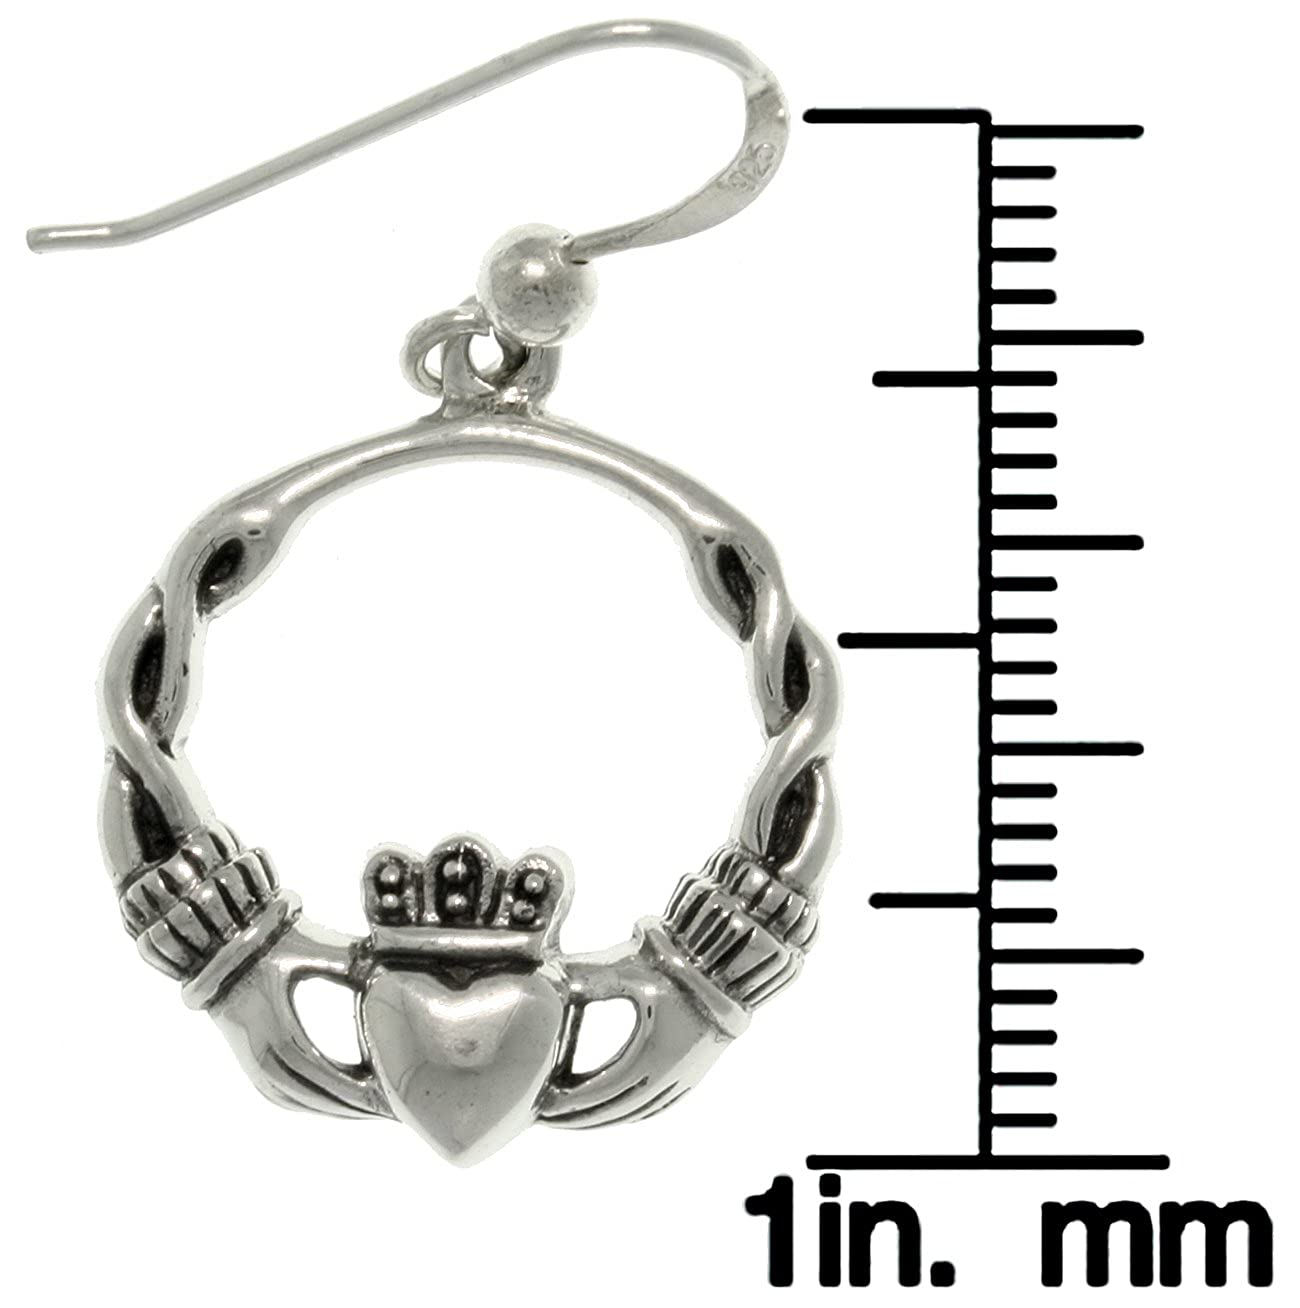 2008a5883 Amazon.com: Jewelry Trends Celtic Claddagh Heart with Crown Sterling Silver  Dangle Hoop Earrings: Dangle Earrings: Jewelry